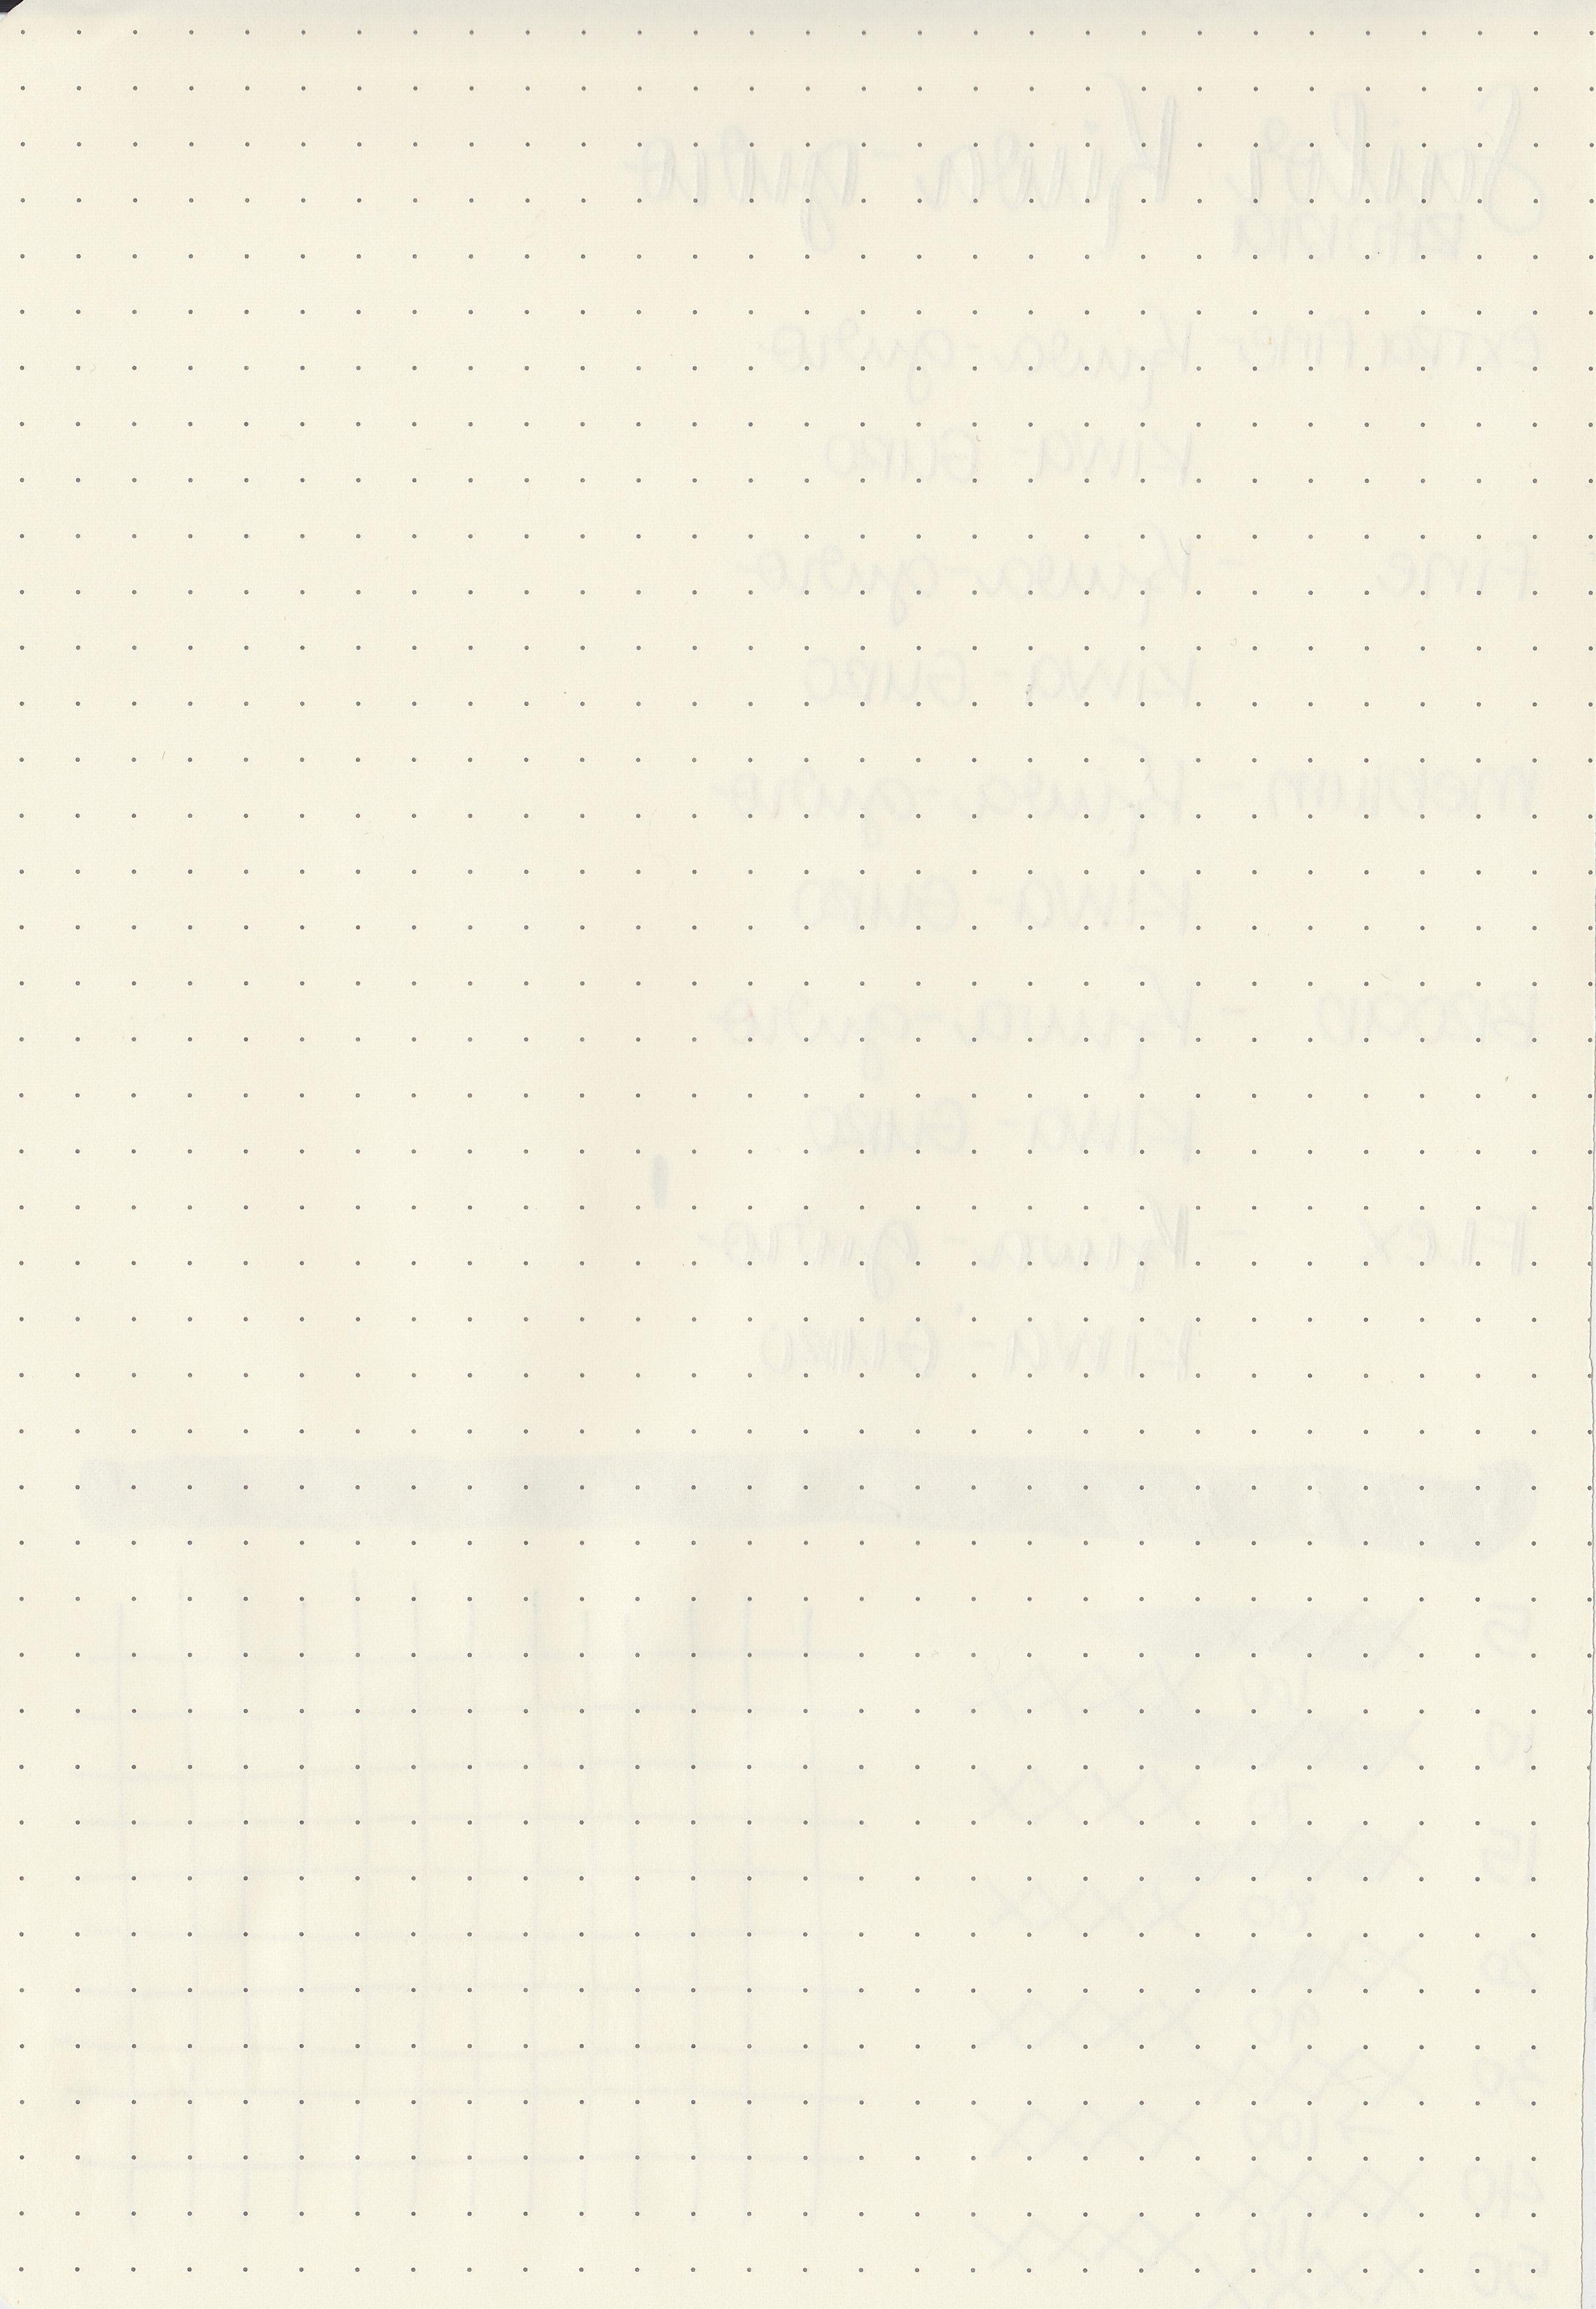 sj-kiwa-guro-4.jpg